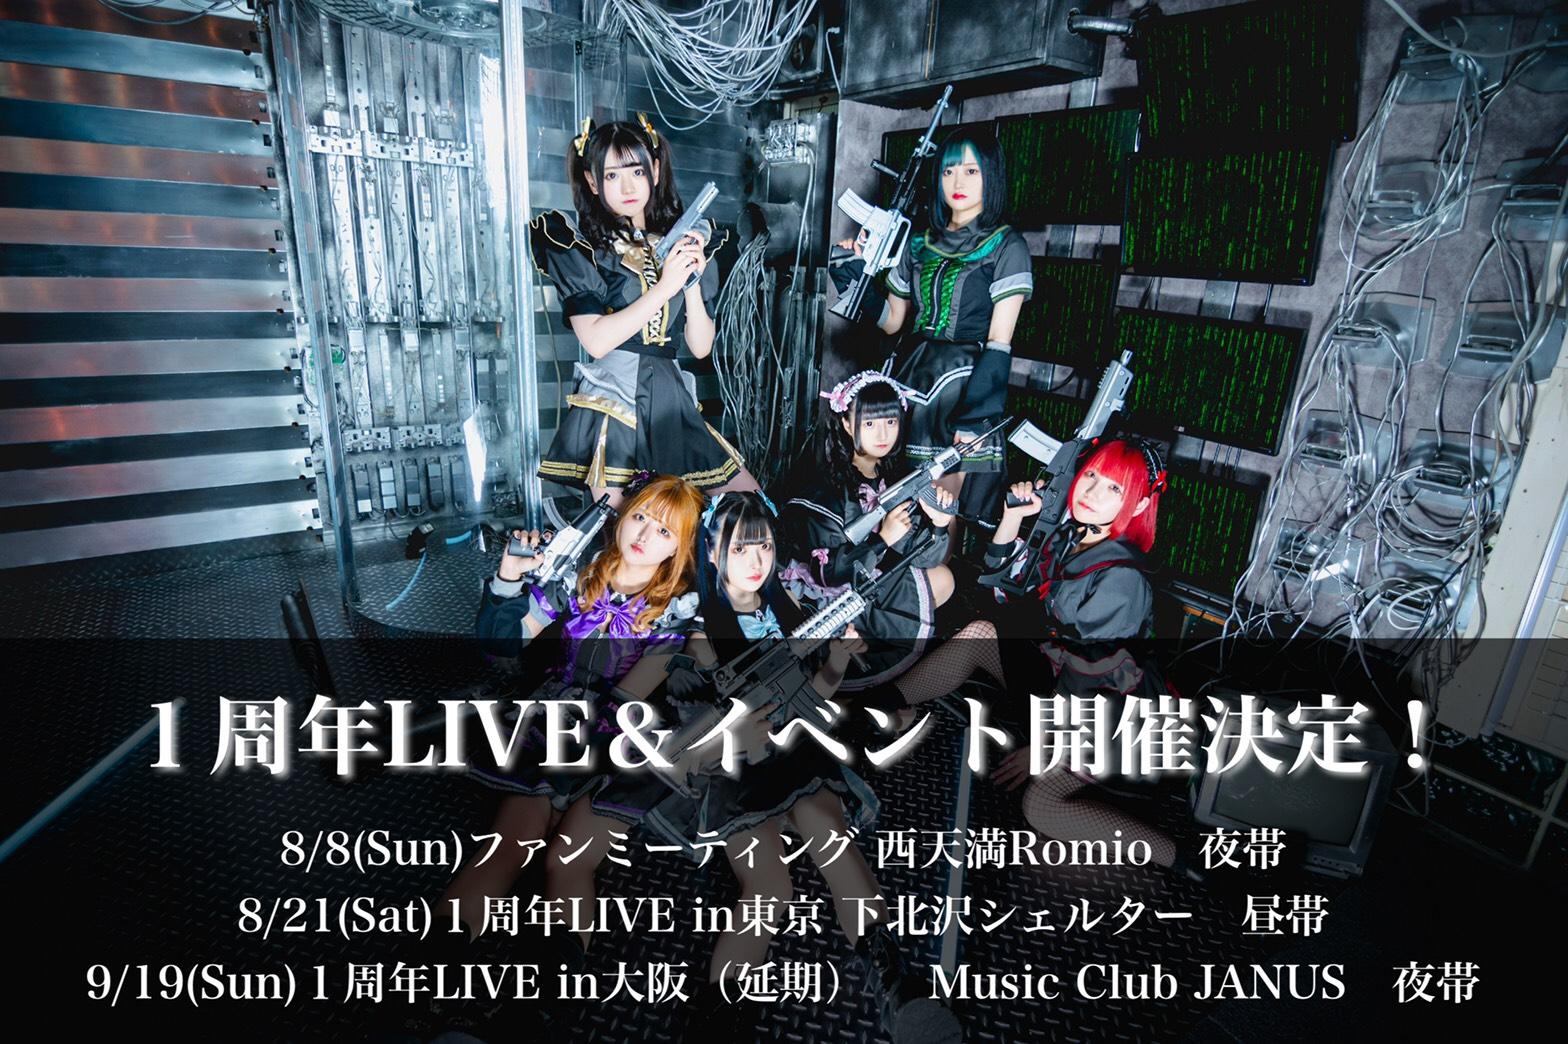 No Escape、No Real!! 〜必りあ1周年でファーストツアーってほんま!?〜in大阪